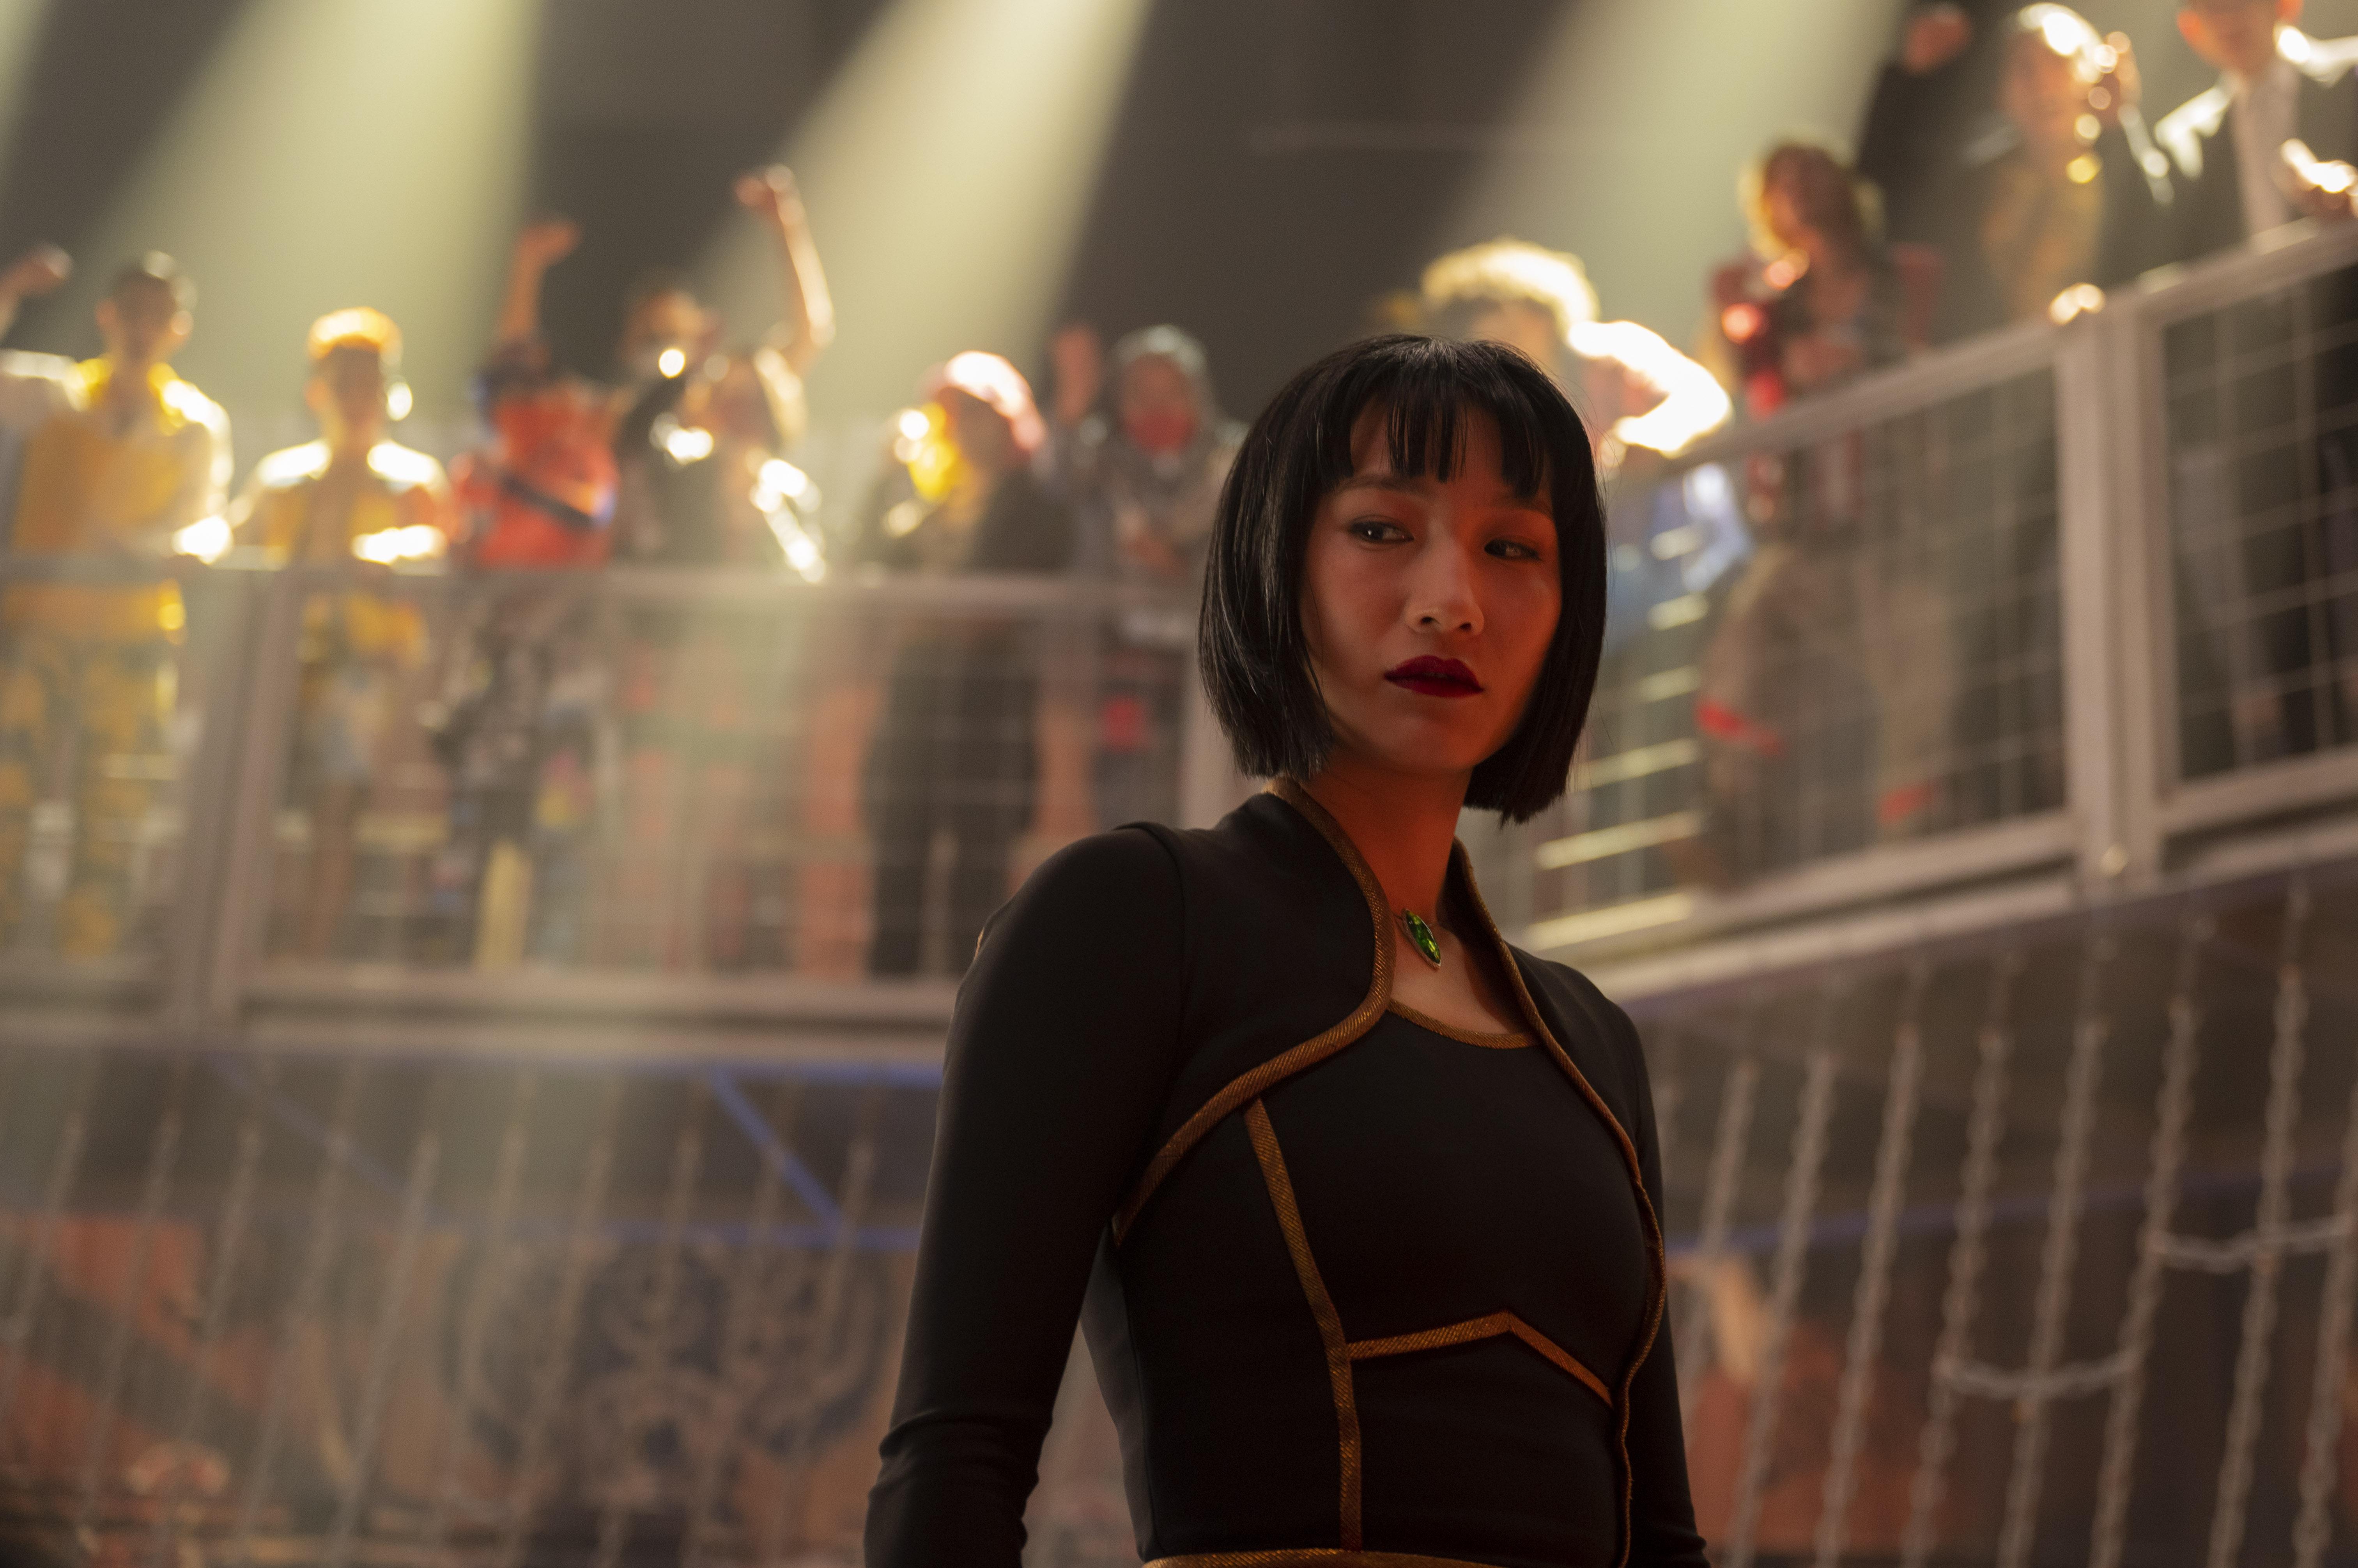 Meng'er Zhang as Xialing in Shang-Chi and the Legend of the Ten Rings.